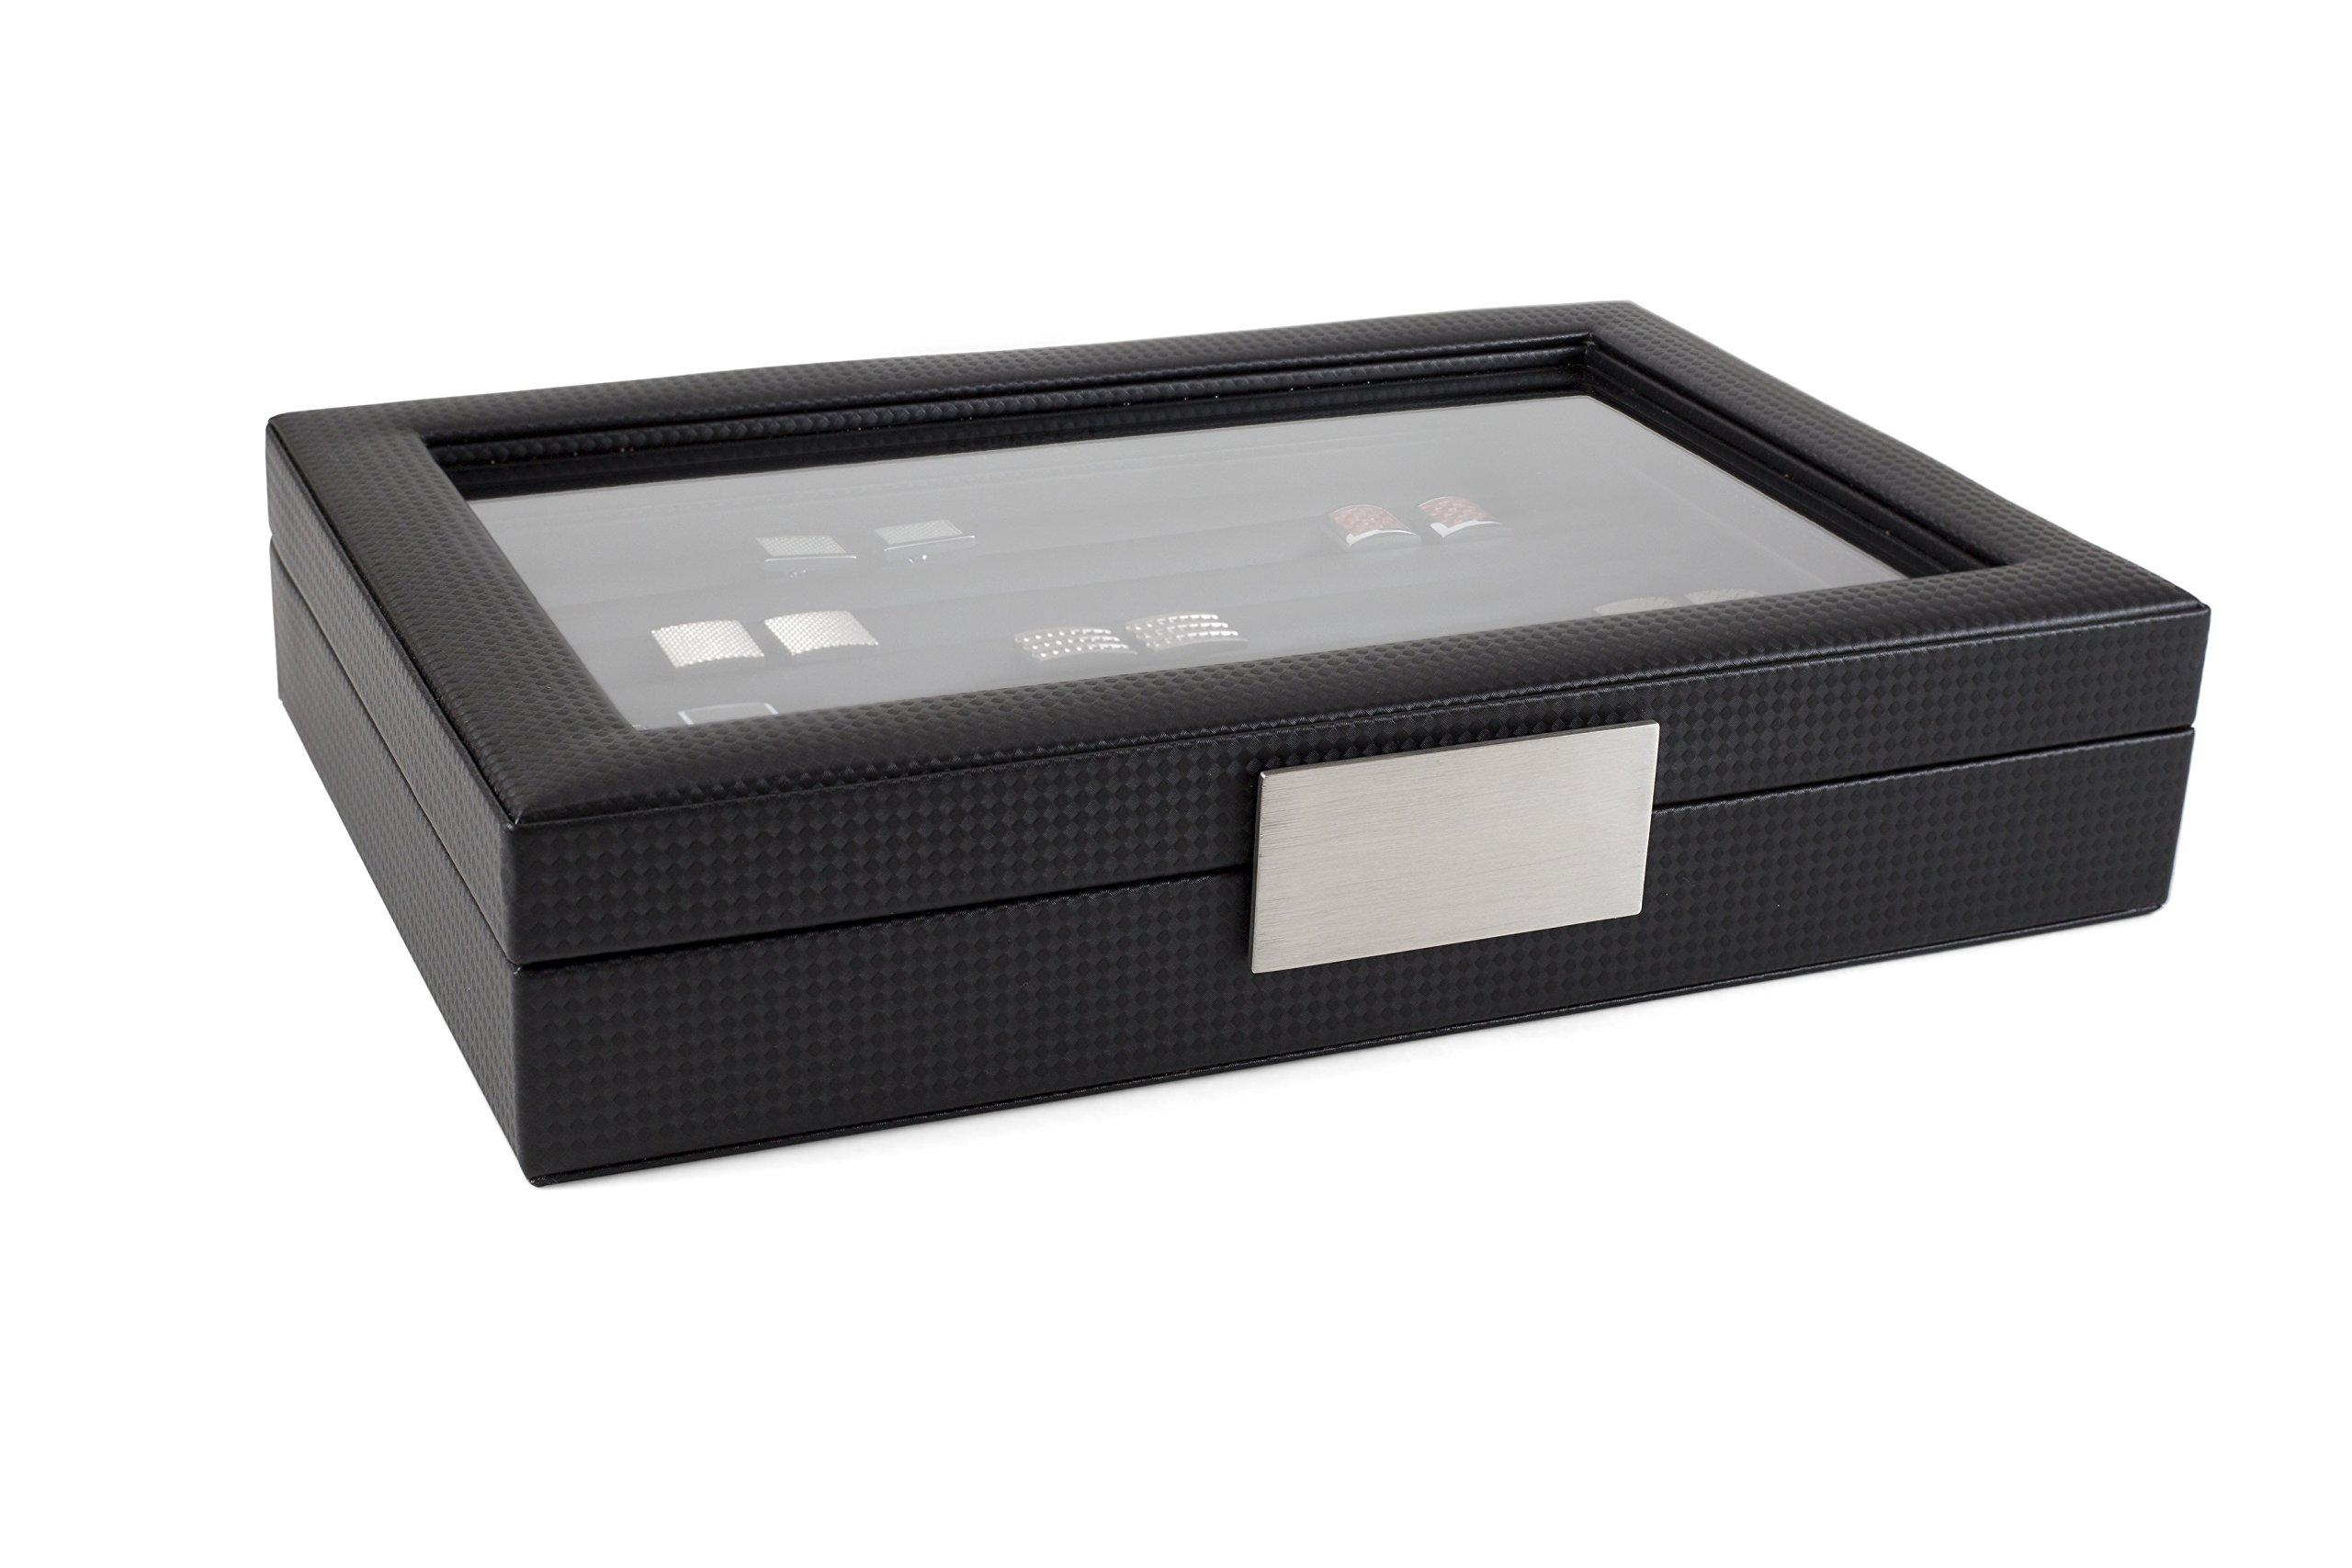 Glenor Co Cufflink Box for Men - Holds 70 Cufflinks - Luxury Display Jewelry Case -Carbon Fiber Design - Metal Buckle Holder, Large Glass Top - Black by Glenor Co (Image #4)